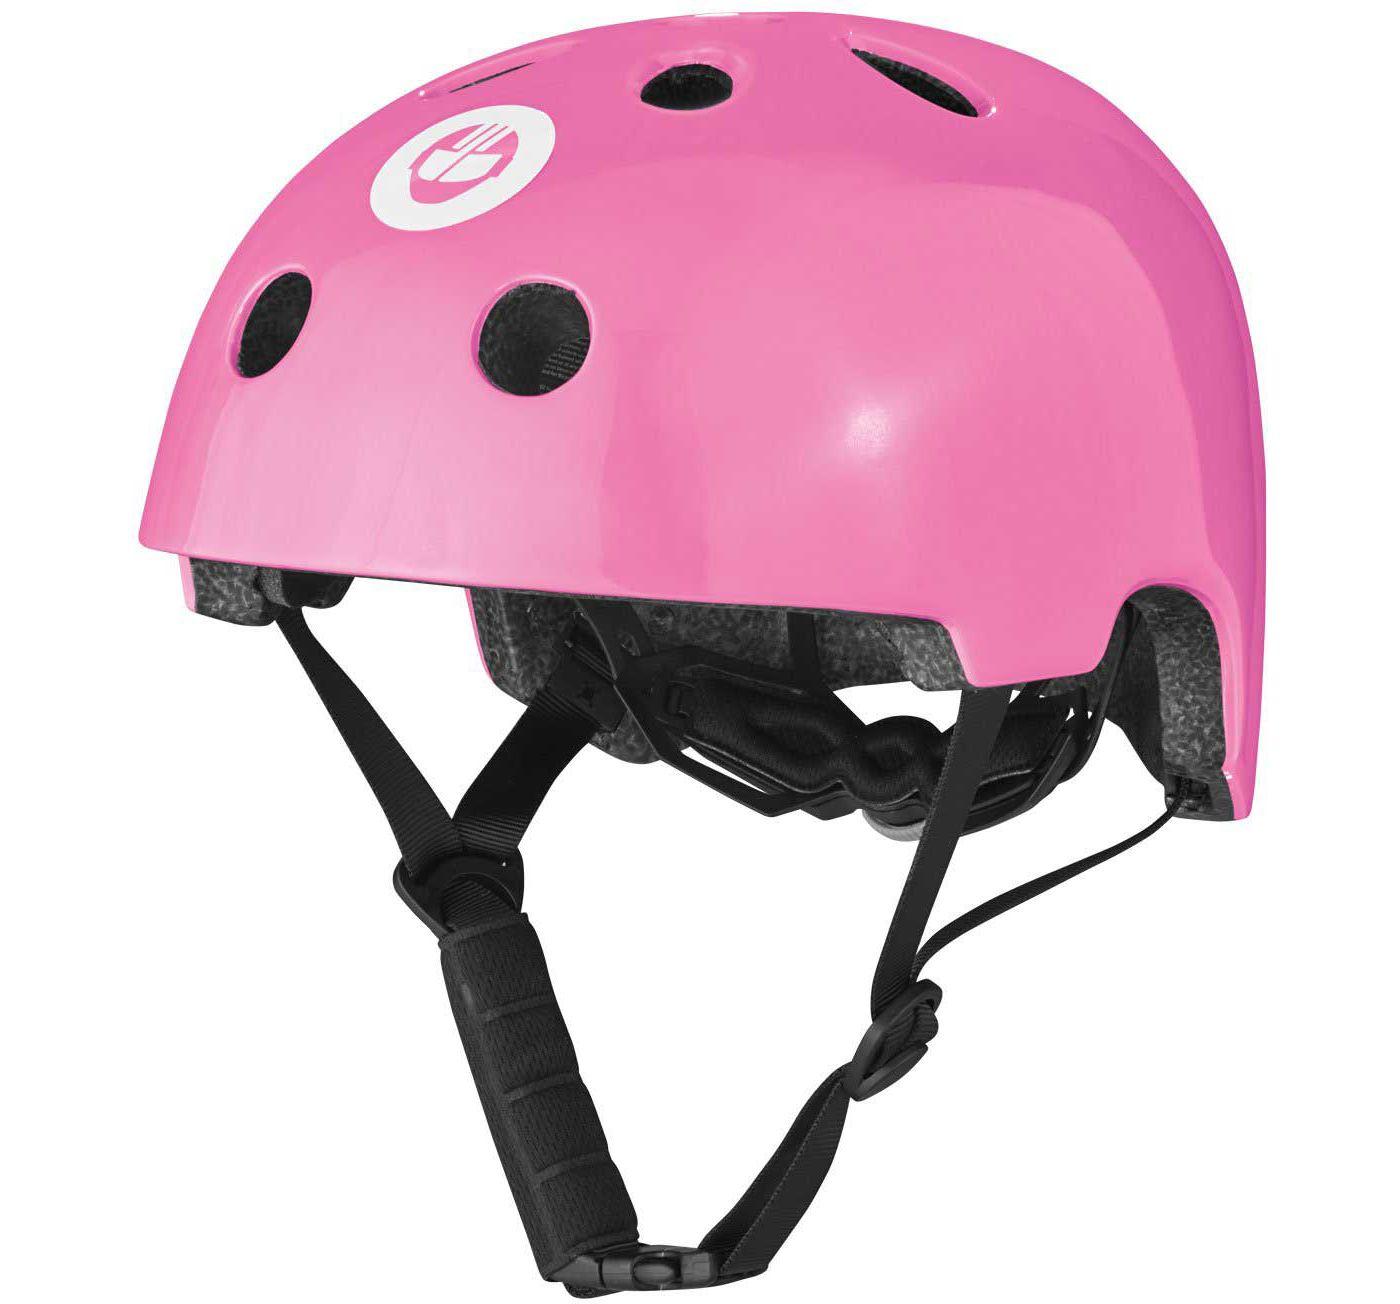 GOTRAX Youth Multi-Sport Helmet